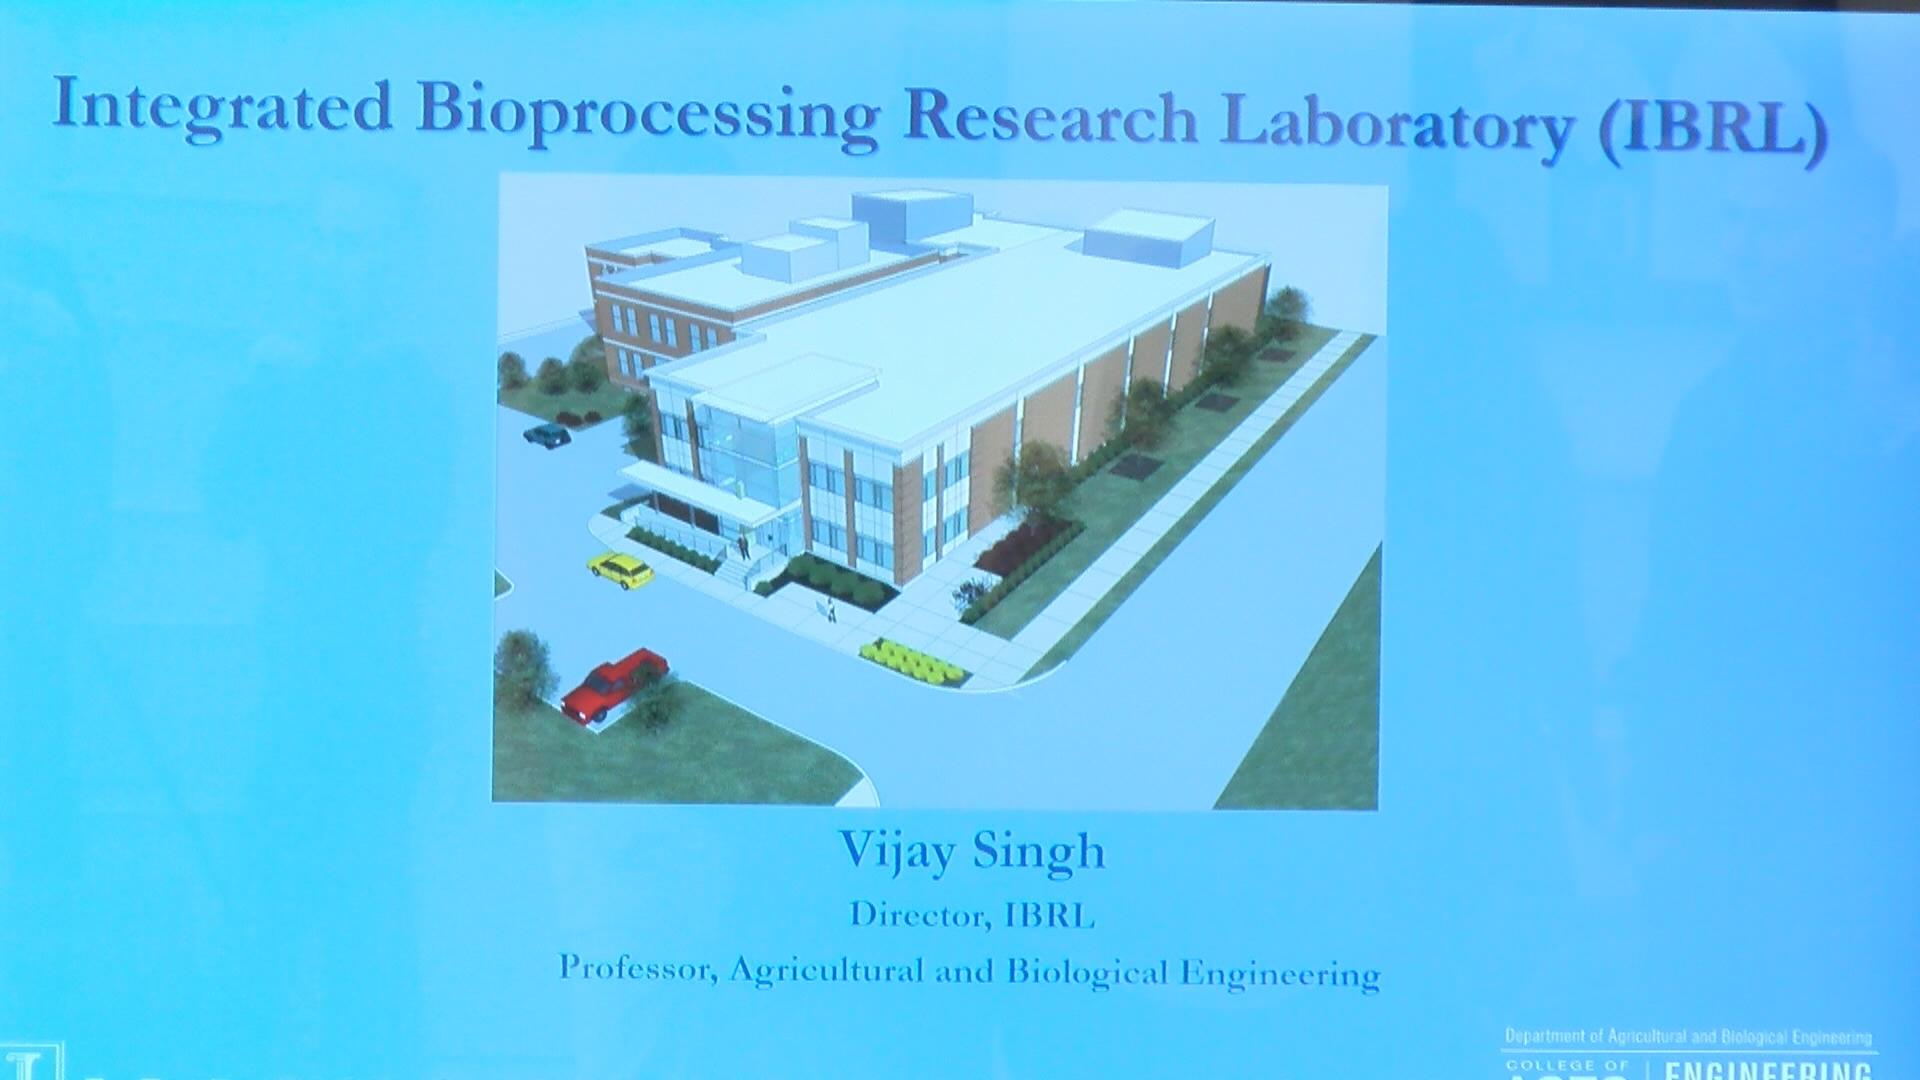 ui ag research lab_1489441350386.jpg